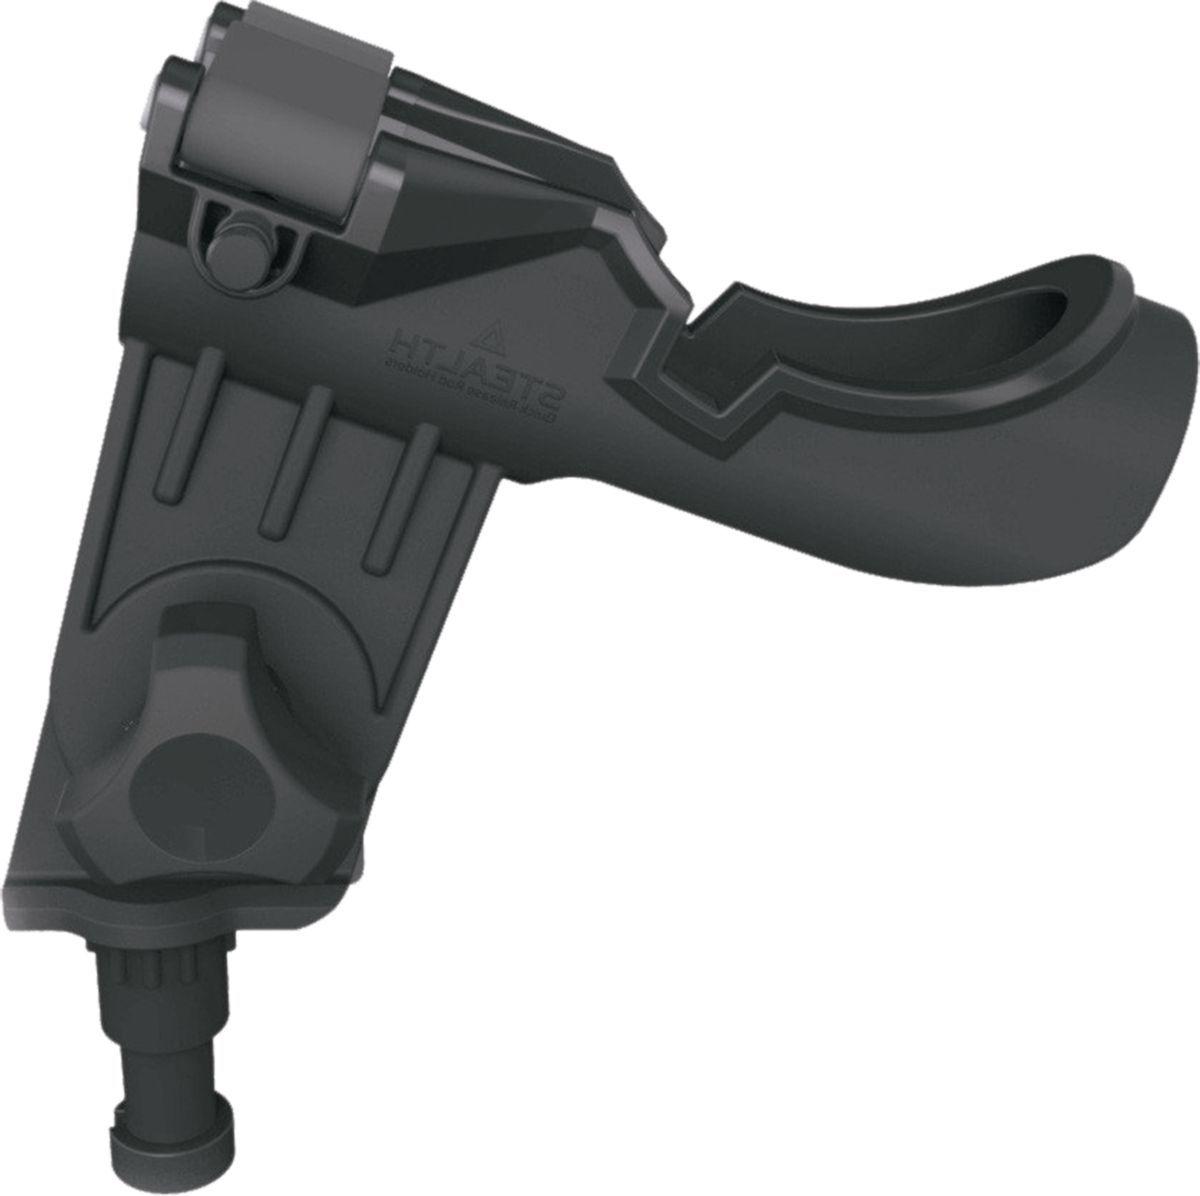 Stealth QR-1 Rod Holder